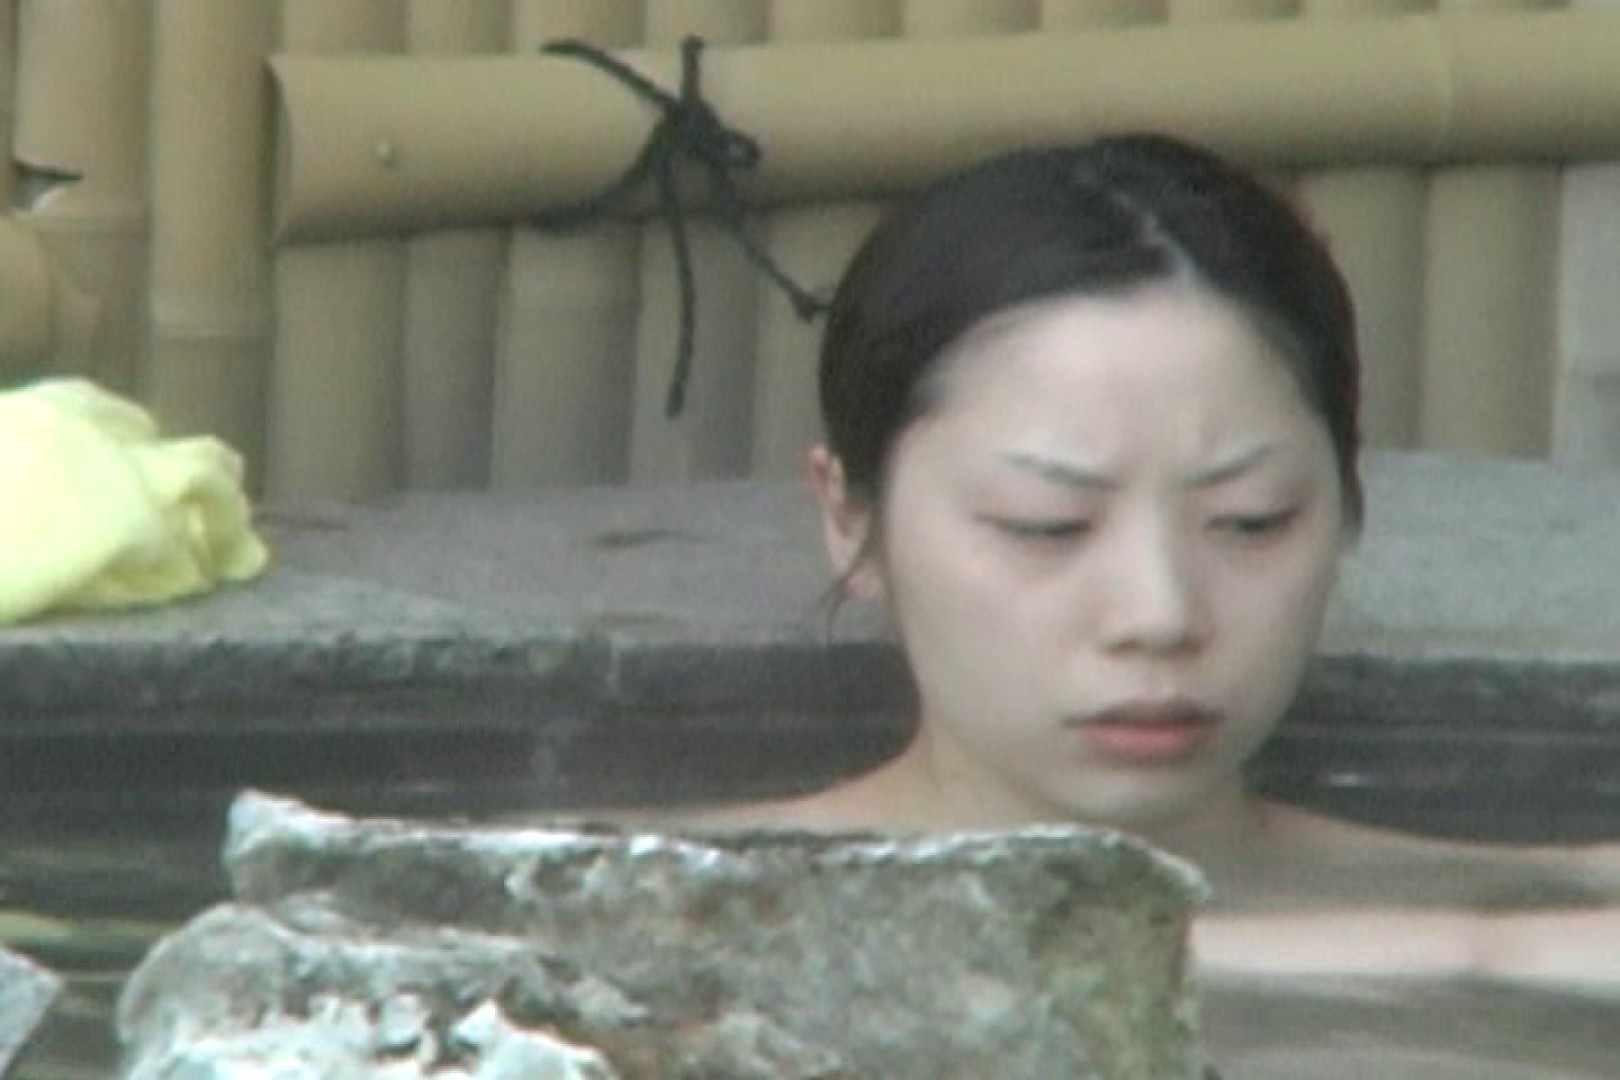 Aquaな露天風呂Vol.596 露天 覗きおまんこ画像 77画像 26